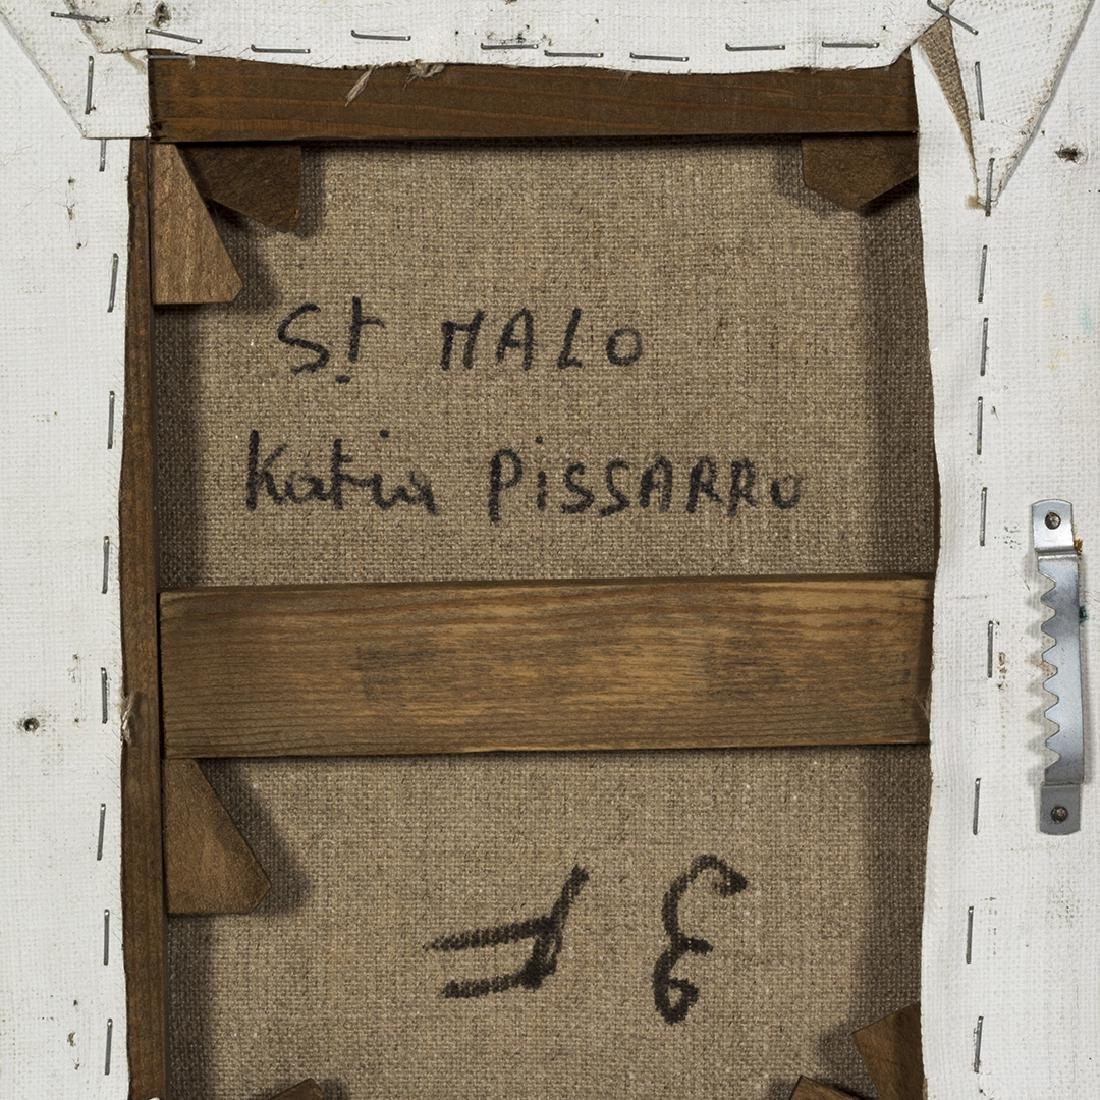 Katia Pissarro St. Halo Oil Painting - 4